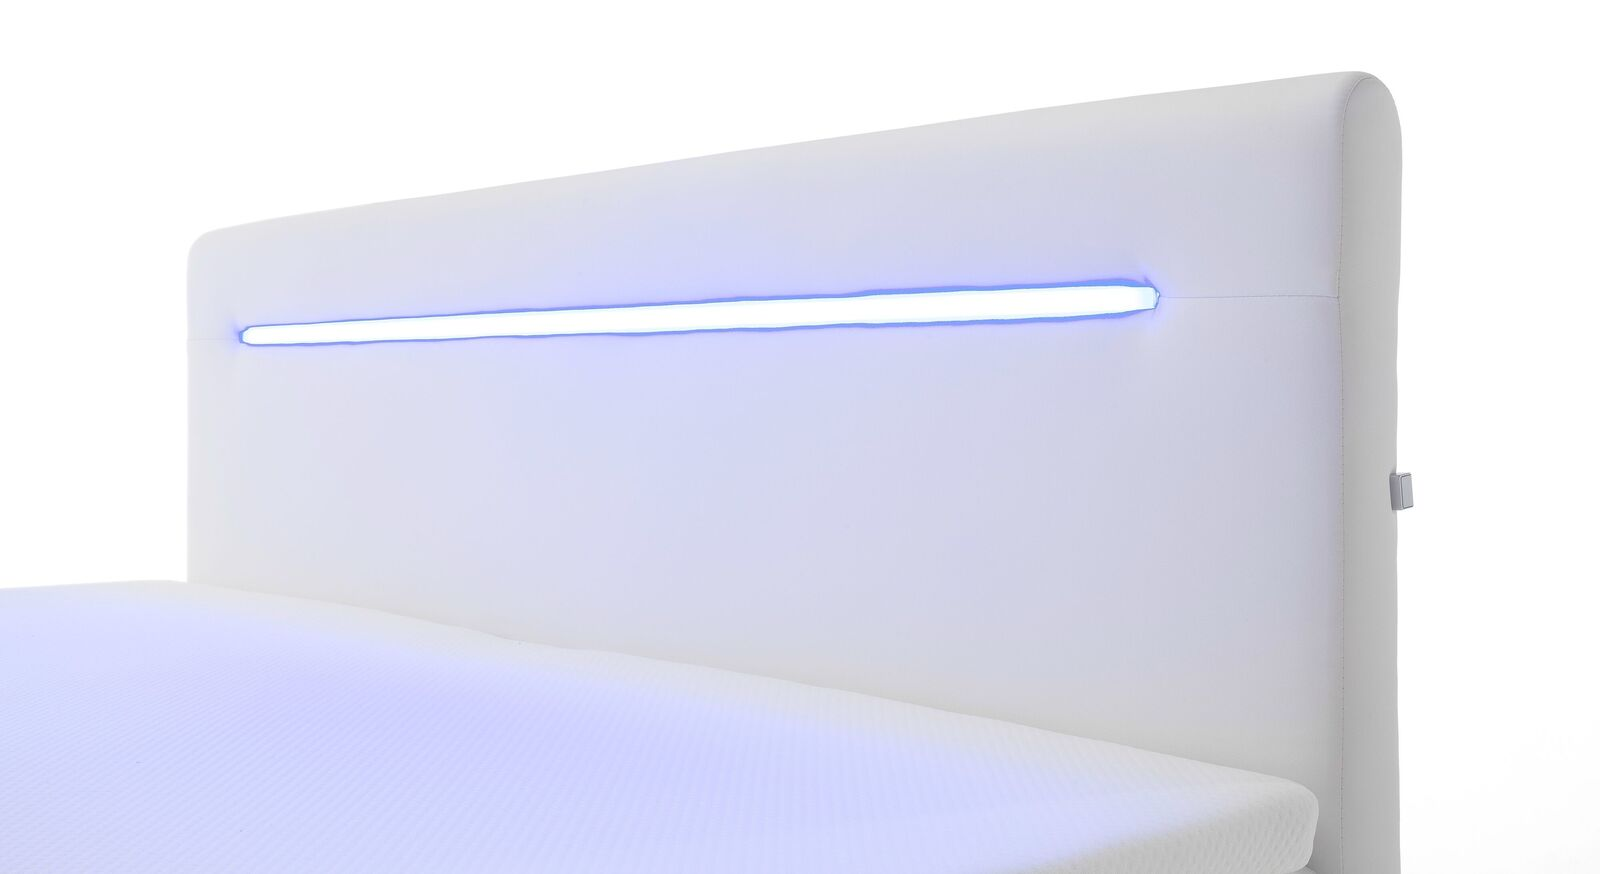 Bettkasten-Boxspringbett Tarasco mit beleuchtetem Kopfteil